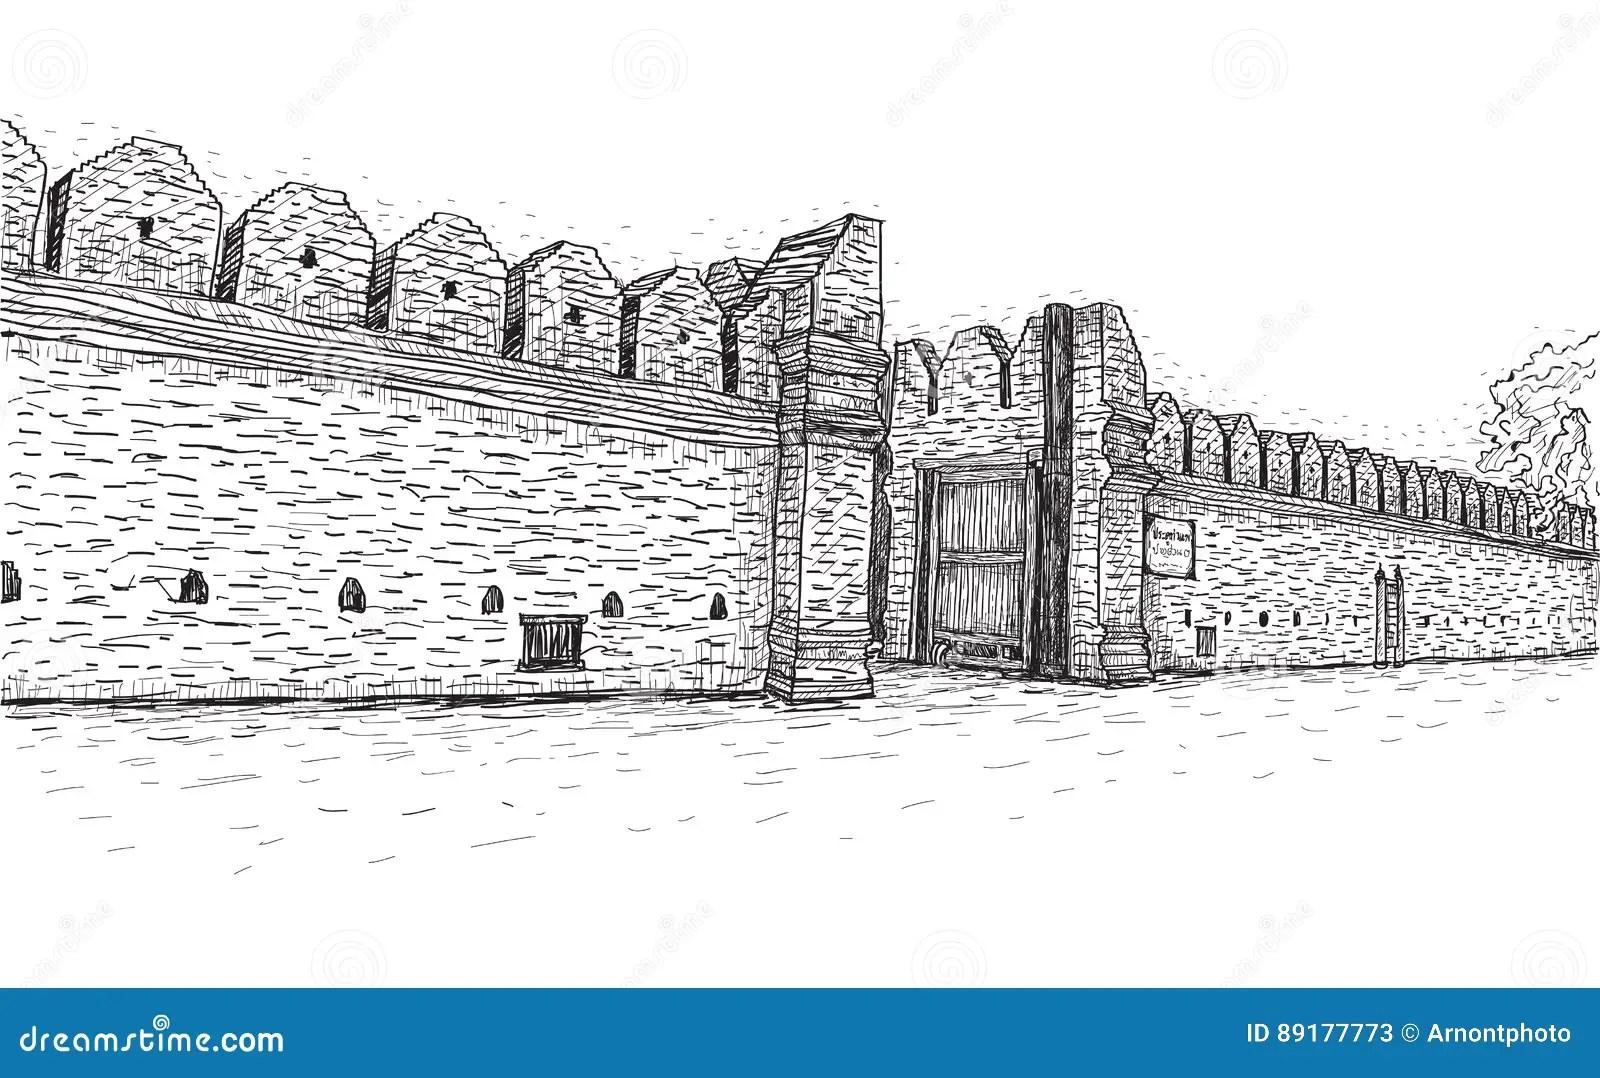 Sketch Of Old Wall Gate Tha Phae Gate In Thailand